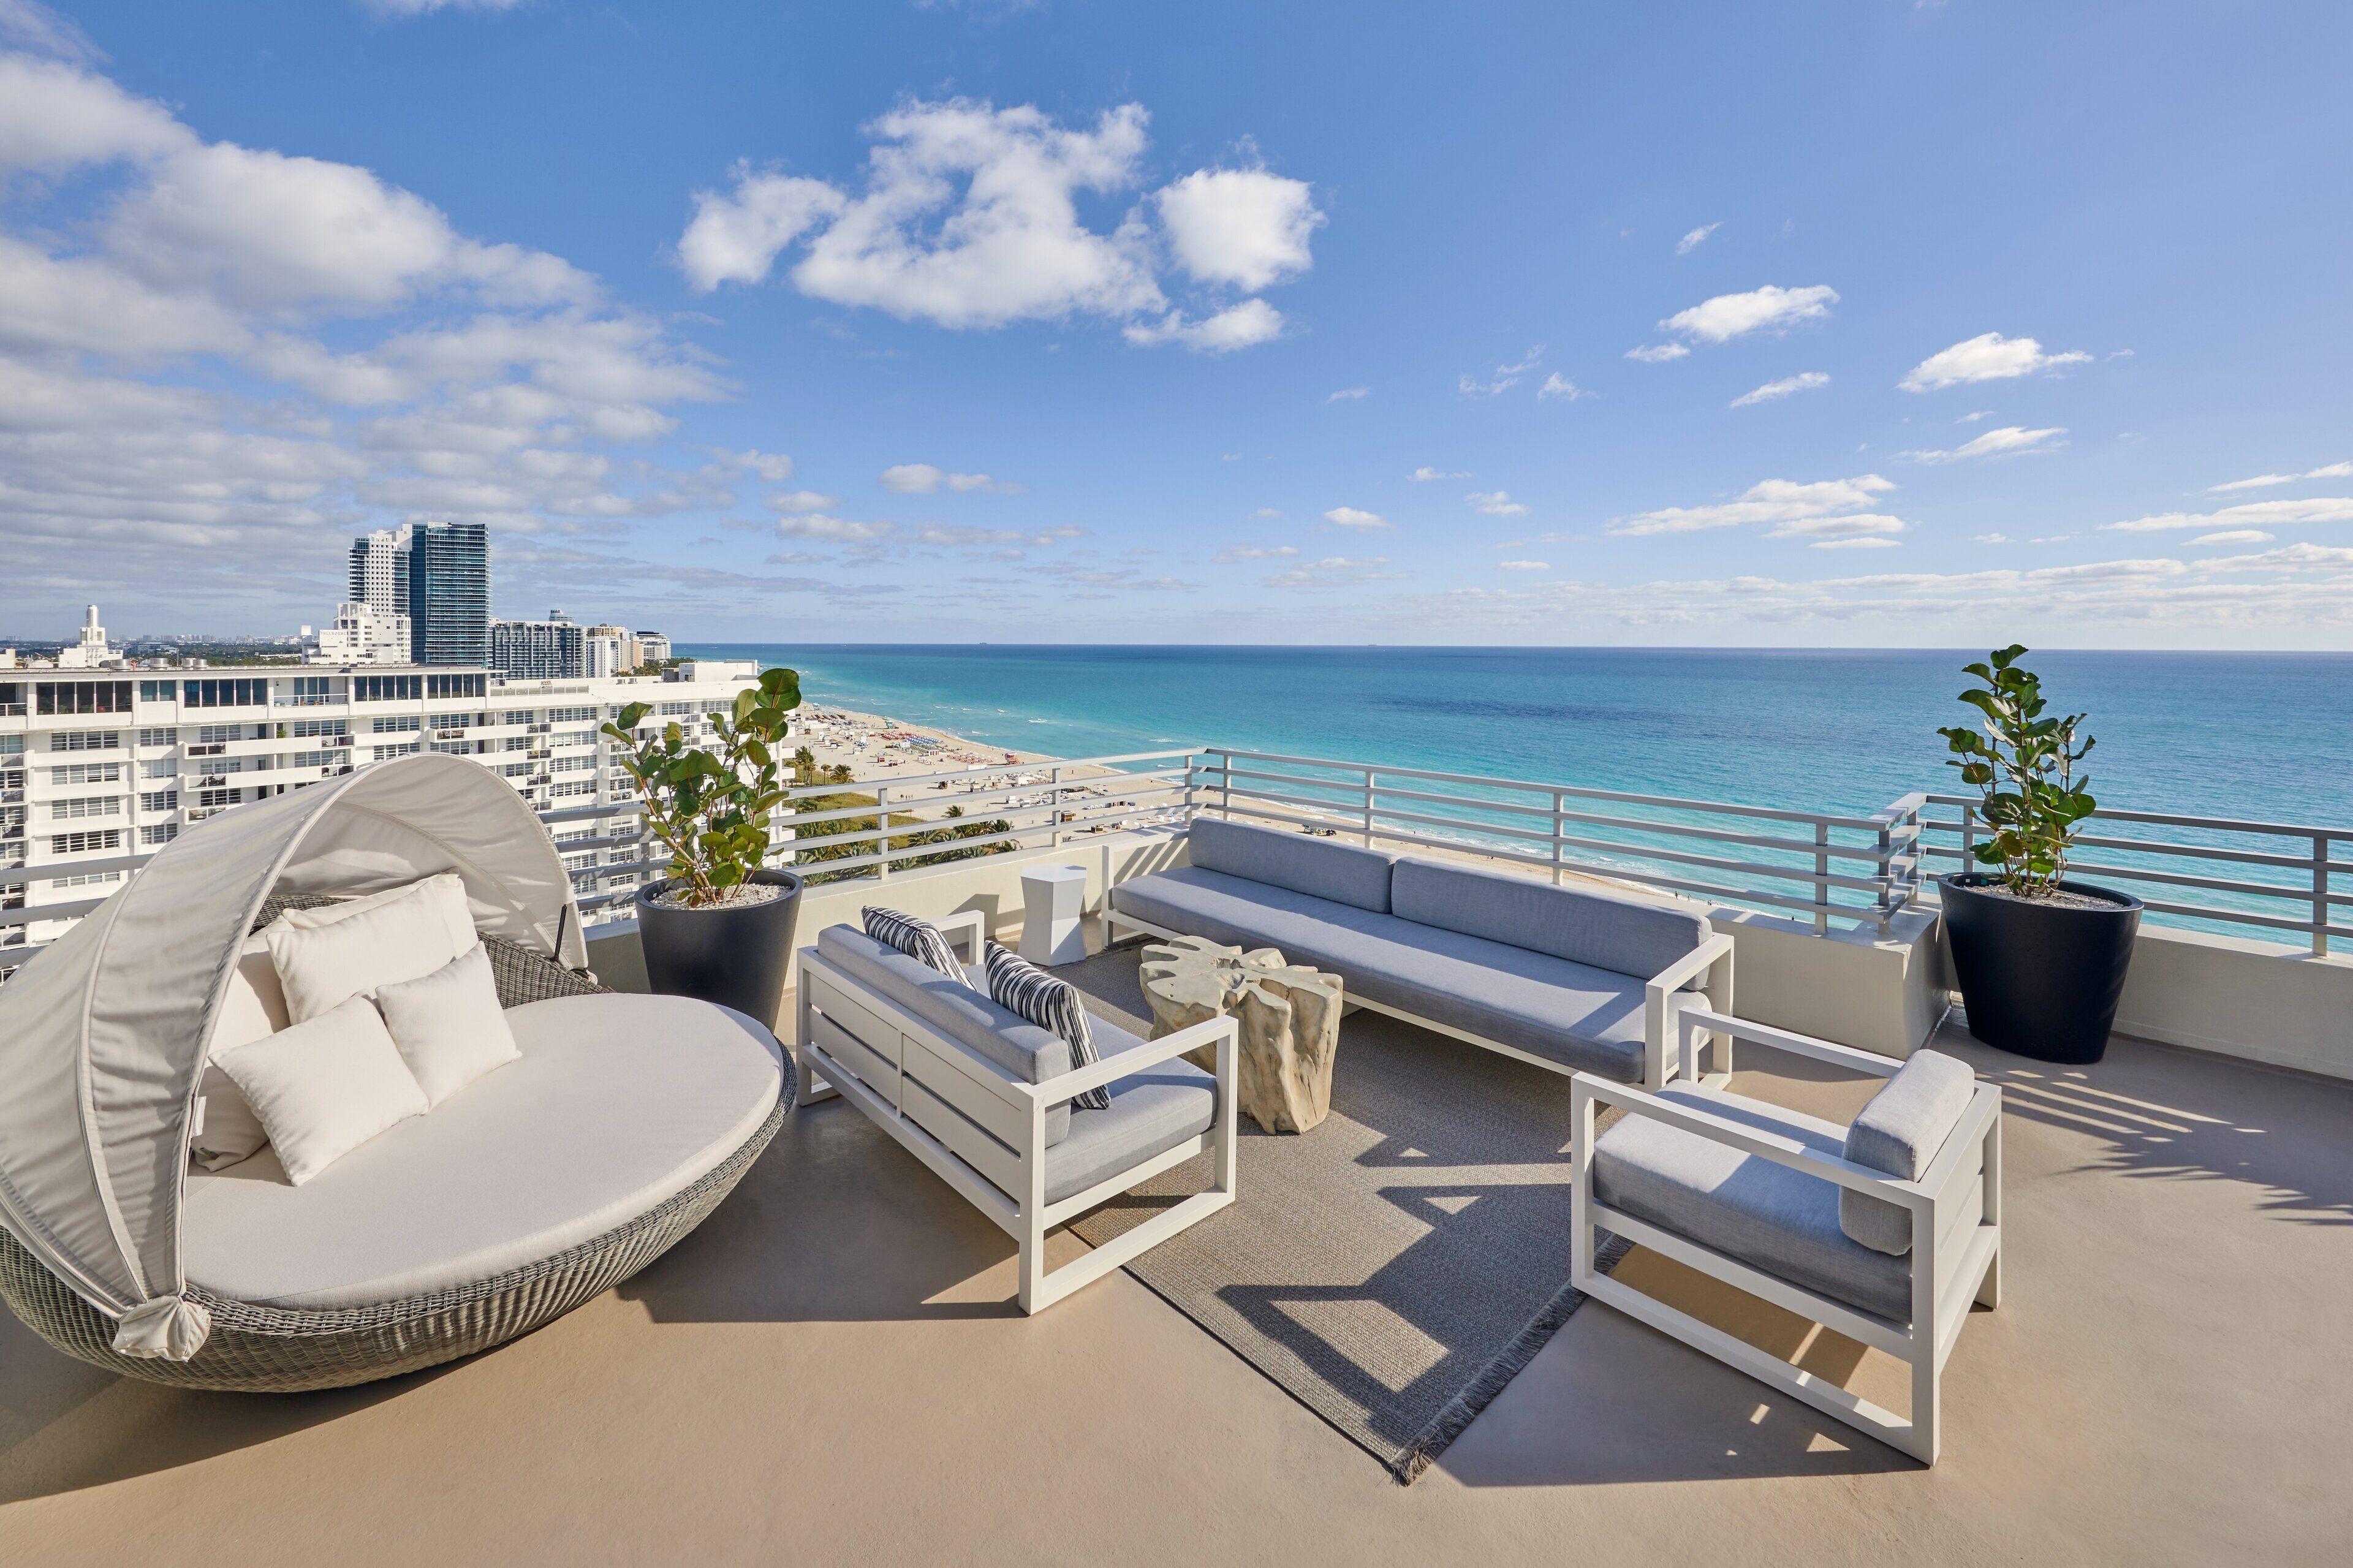 Courtesy of Loews Miami Beach Hotel / Expedia